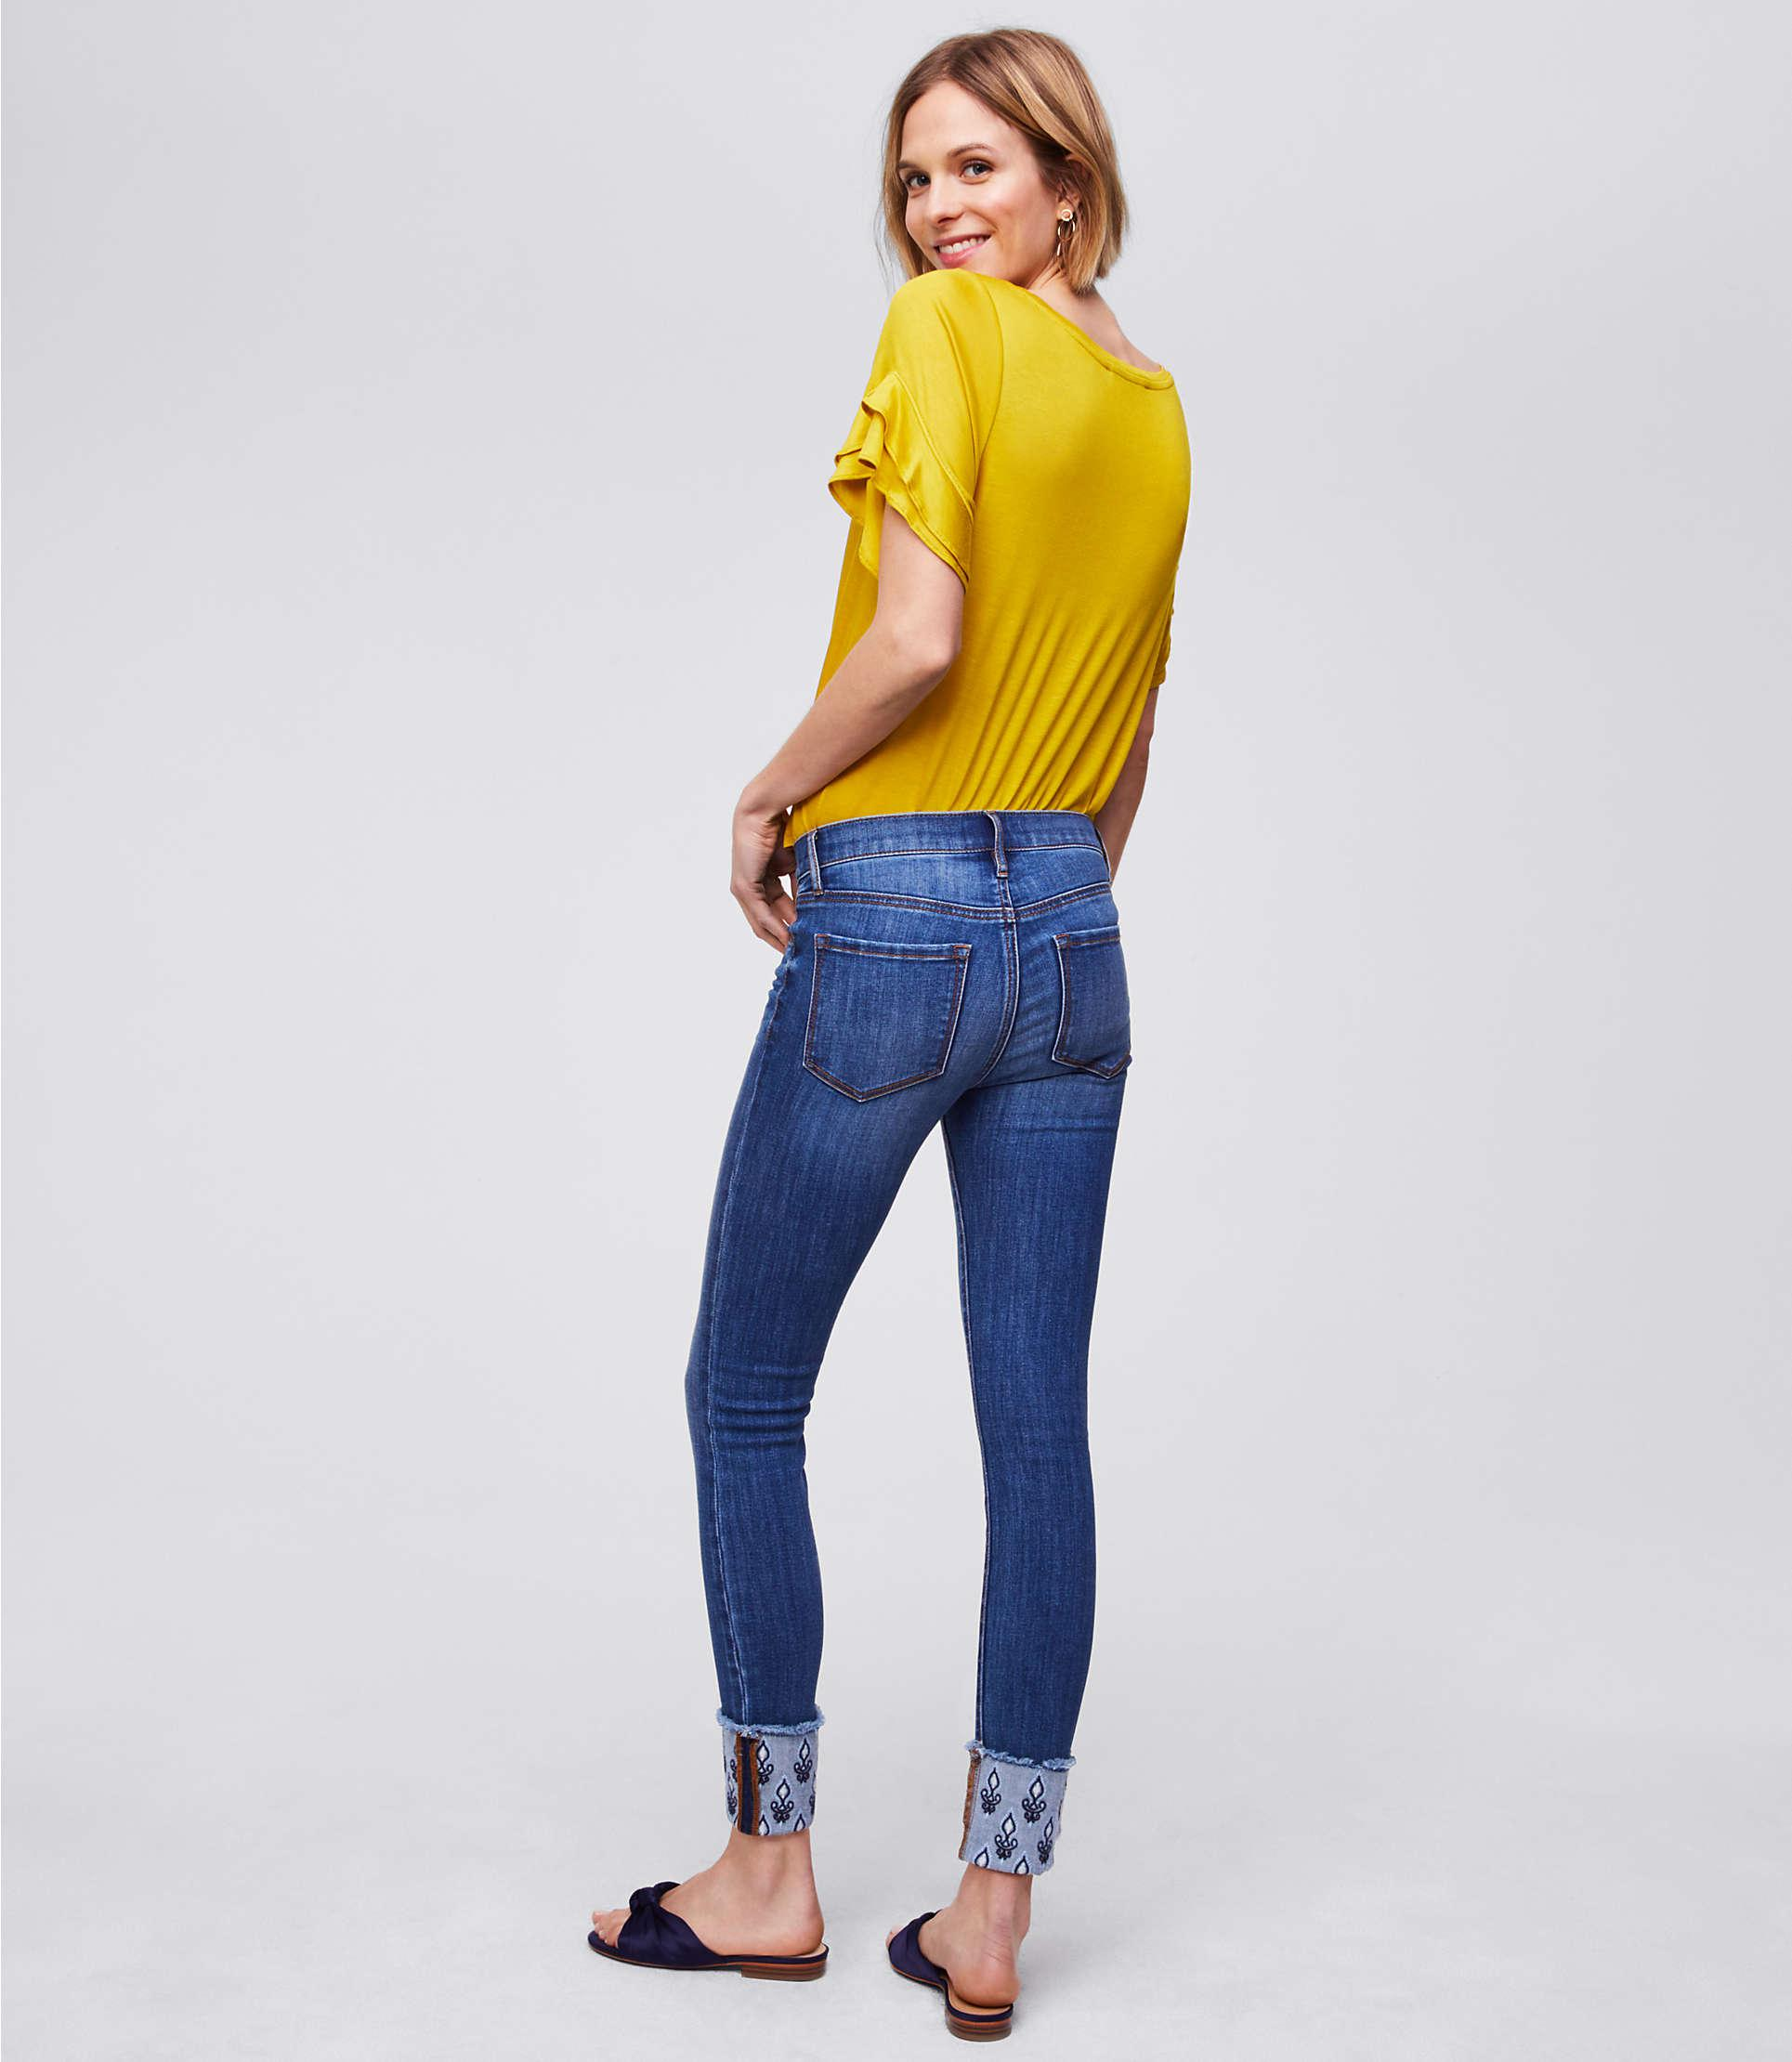 b6fd296c172bb Lyst - LOFT Modern Floral Embroidered Cuffed Skinny Jeans in Blue